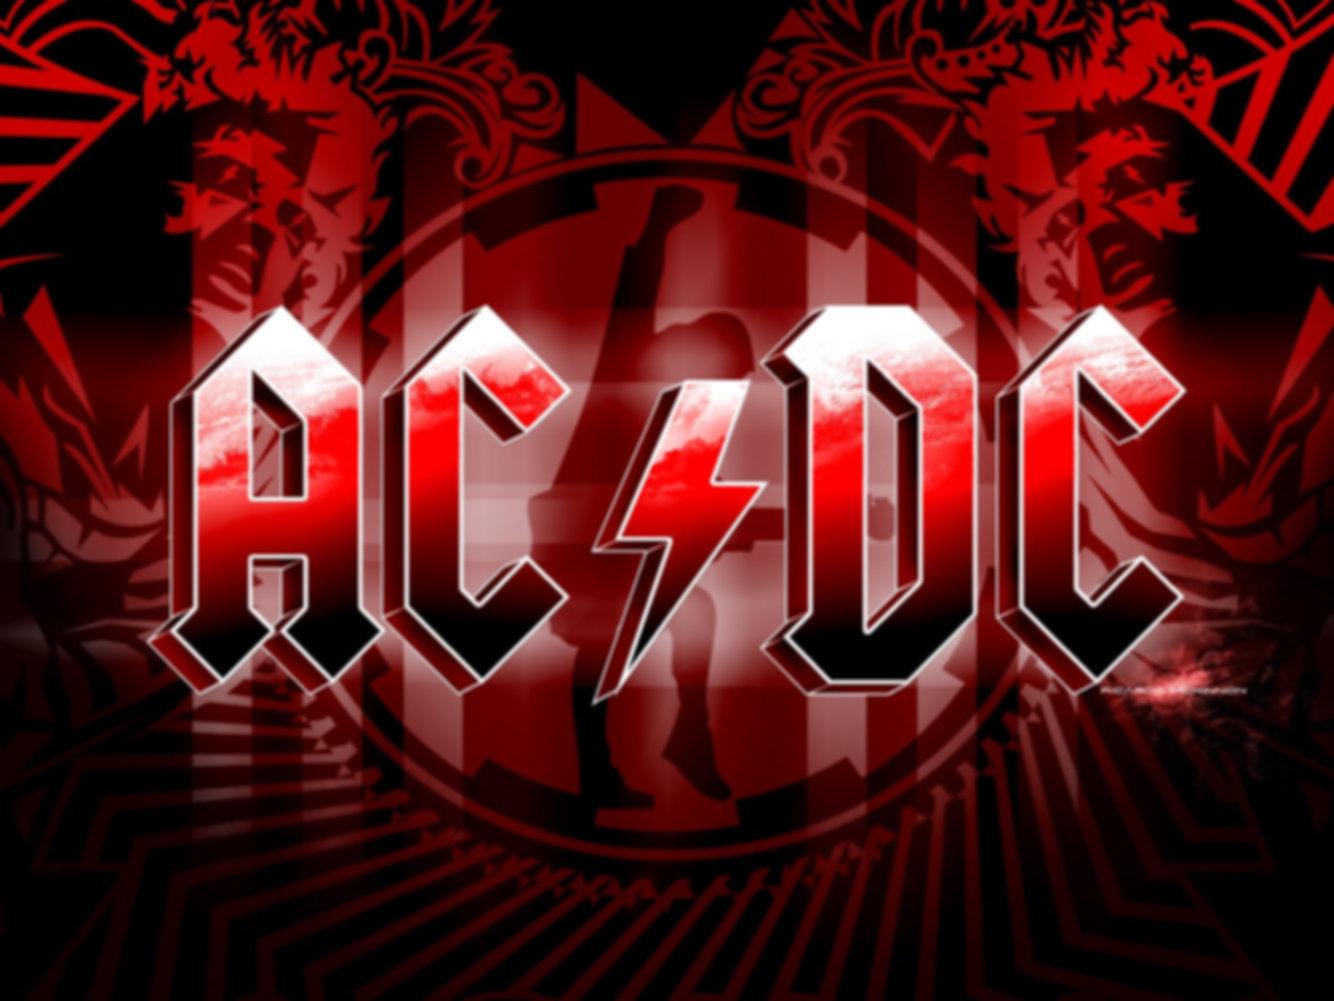 138-1384585_ac-dc-download-ac-dc-desktop